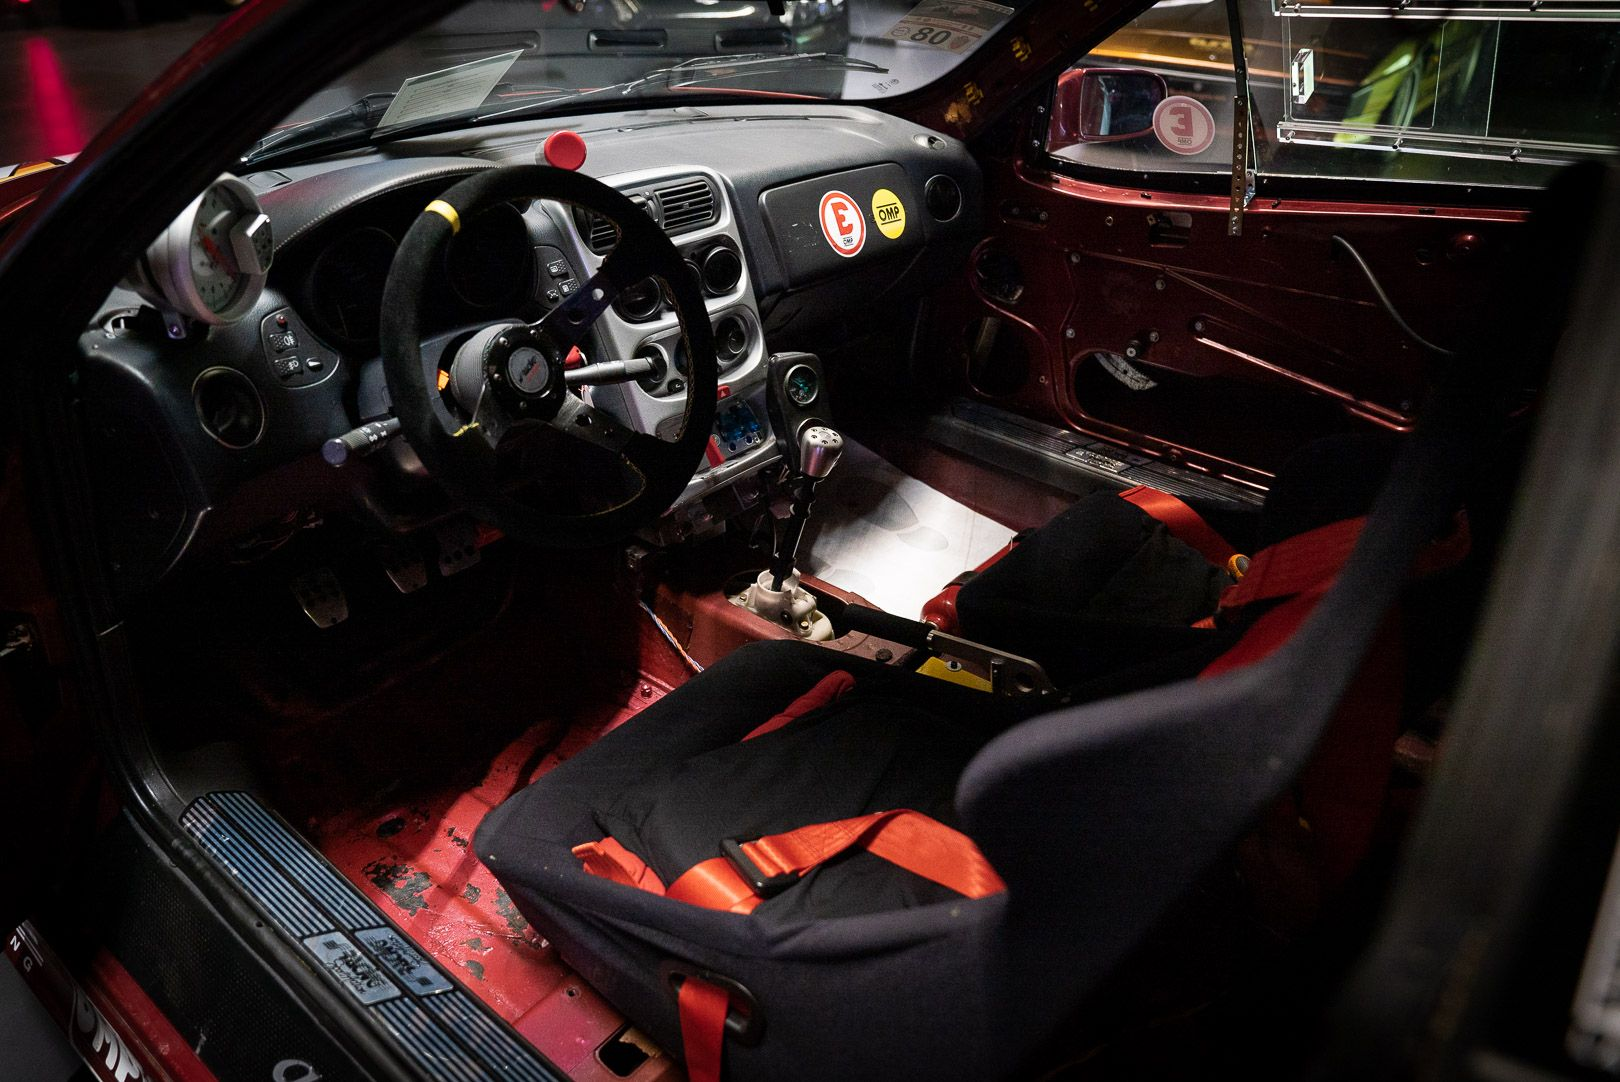 1995 Alfa Romeo GTV 2.0 V6 Turbo Cup Replica 59936